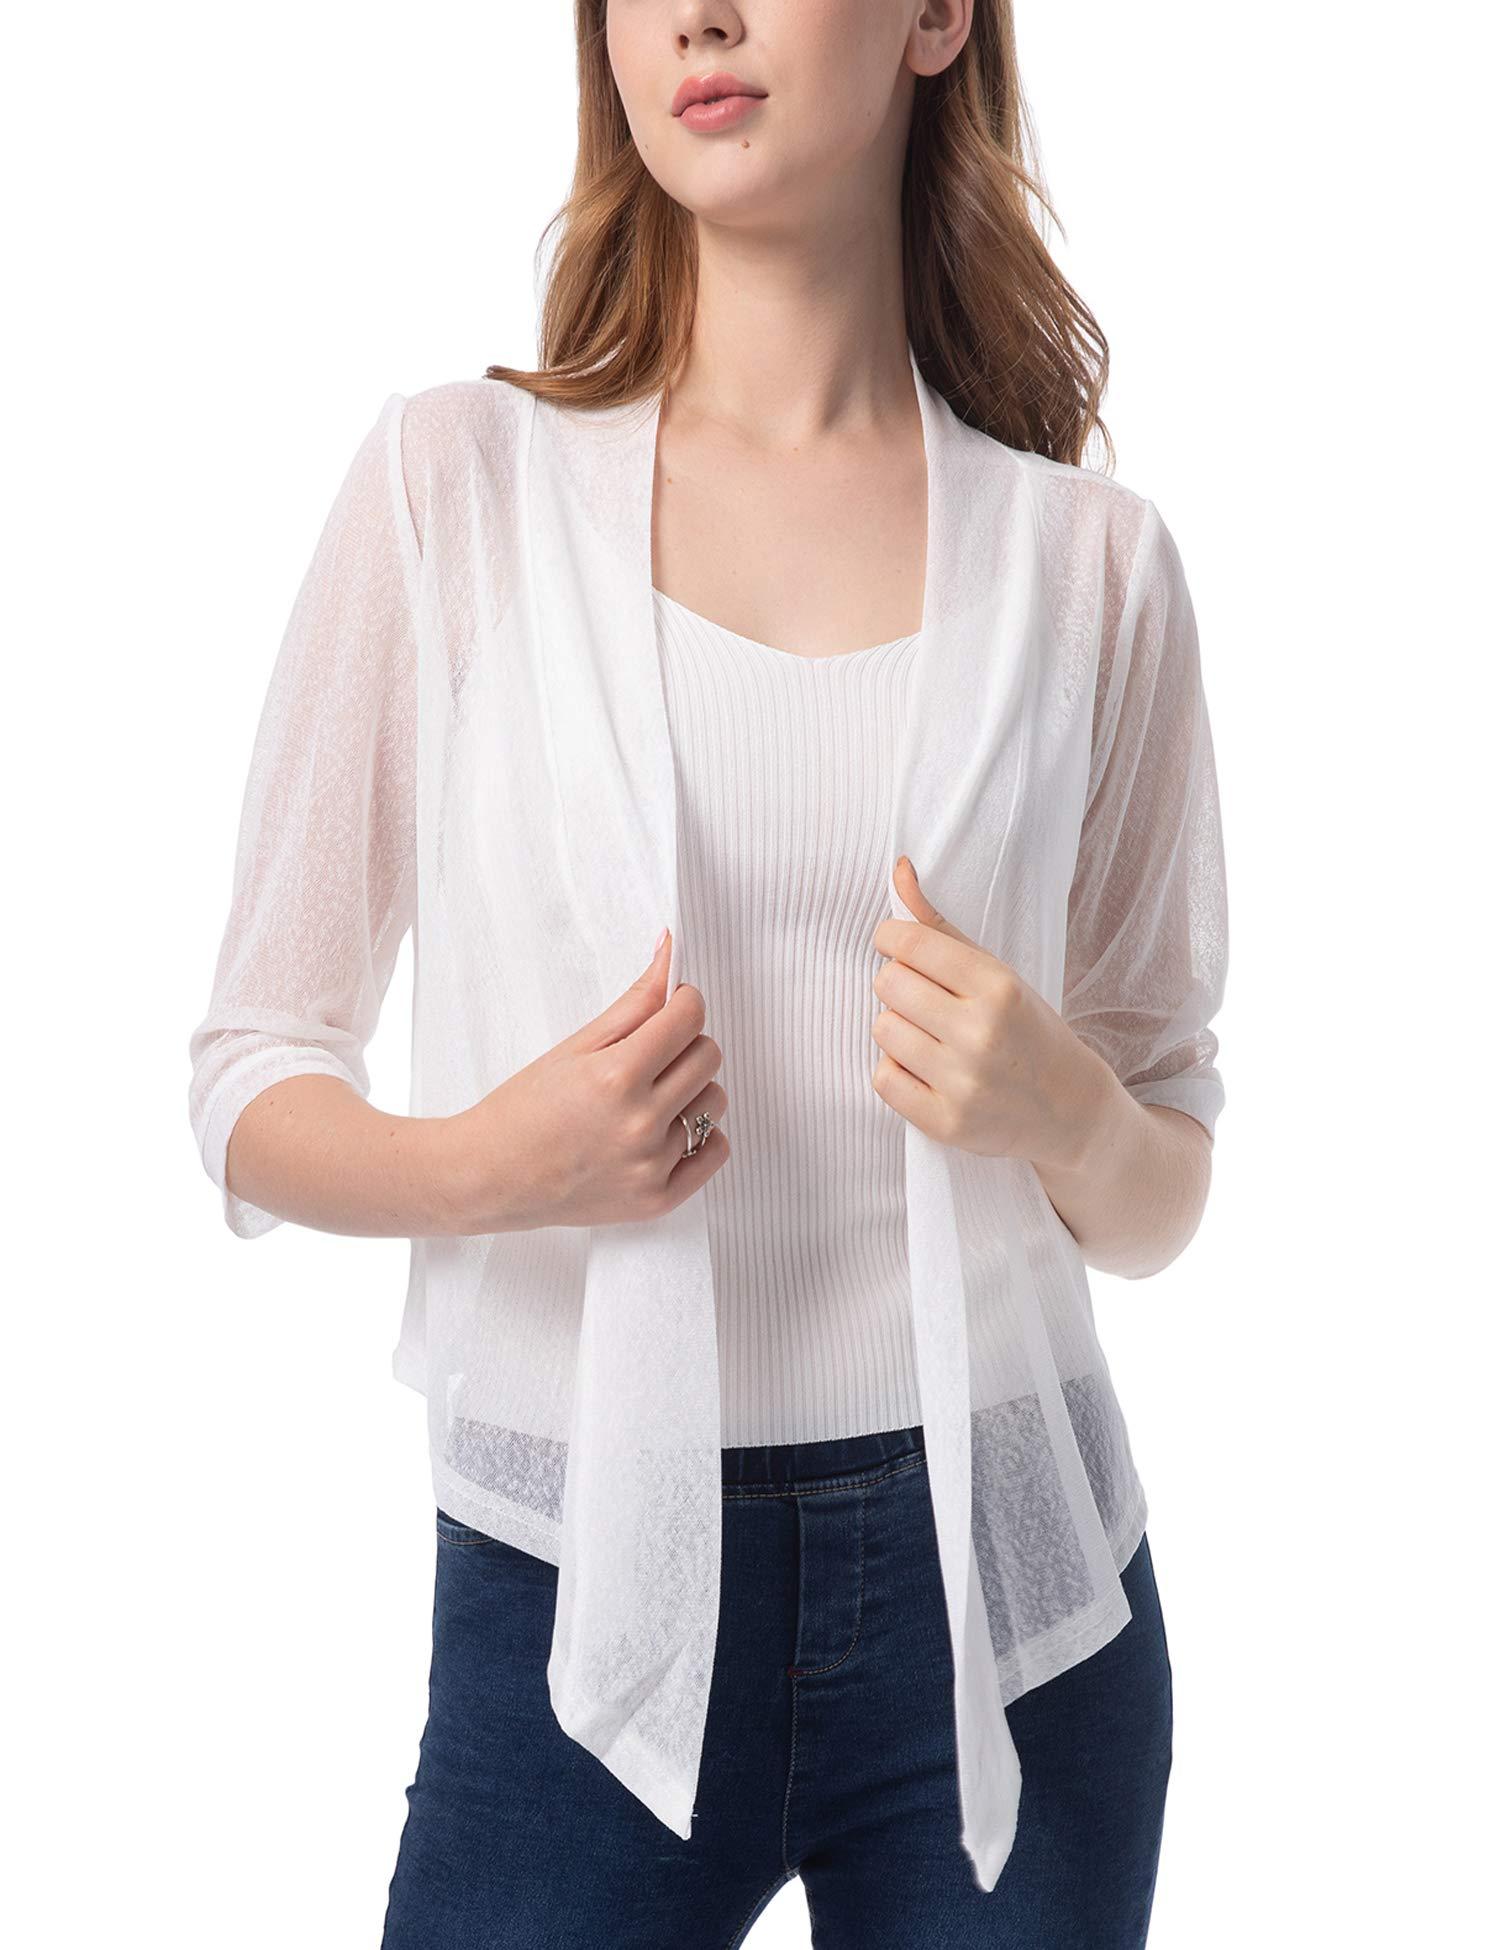 8f5aa45cb9 Women s 3 4 Sleeve Ruffle Design Cropped Bolero Shrug Open Front Cardigan